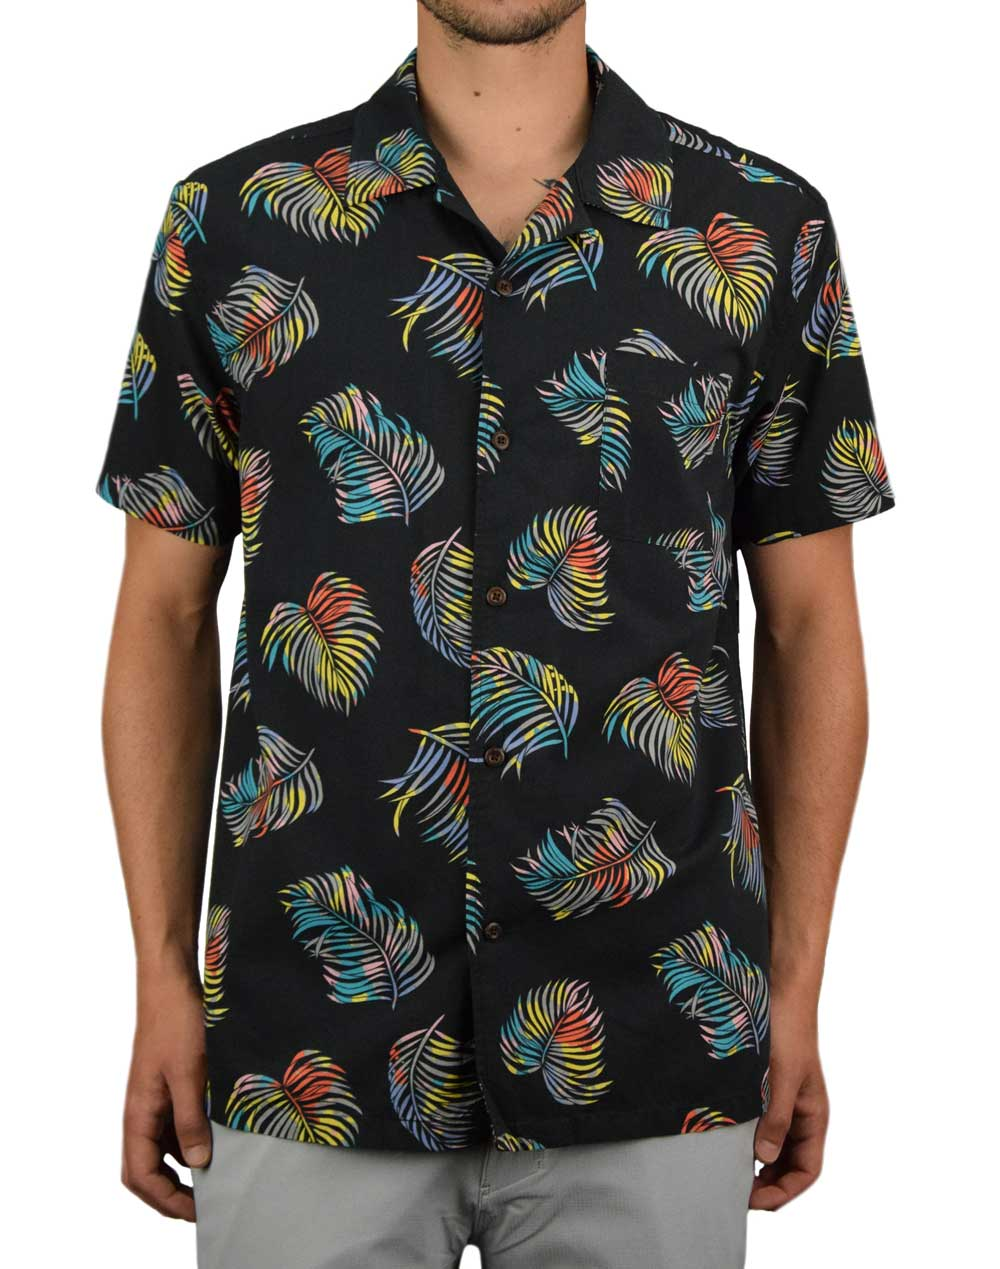 Hurley Botanical T-Shirt (CN9829-010) Black